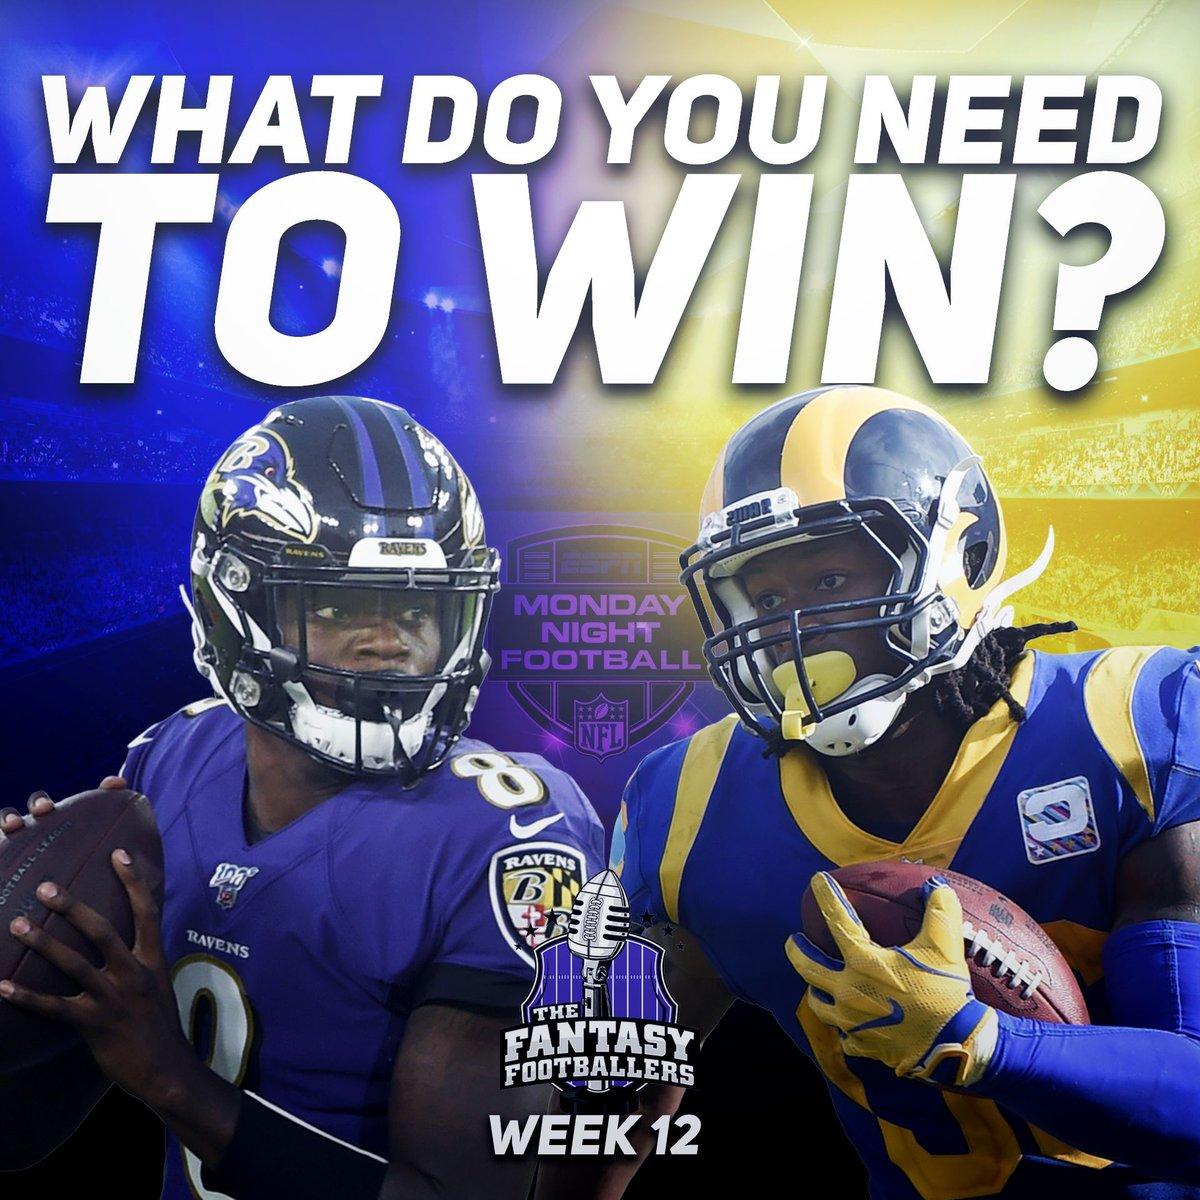 What do you need to happen tonight to get a #Week12 Win? #fantasyfootball #mondaynightfootball #MNF #ravens #rams #BALvsLAR<br>http://pic.twitter.com/0O15dIrGA9